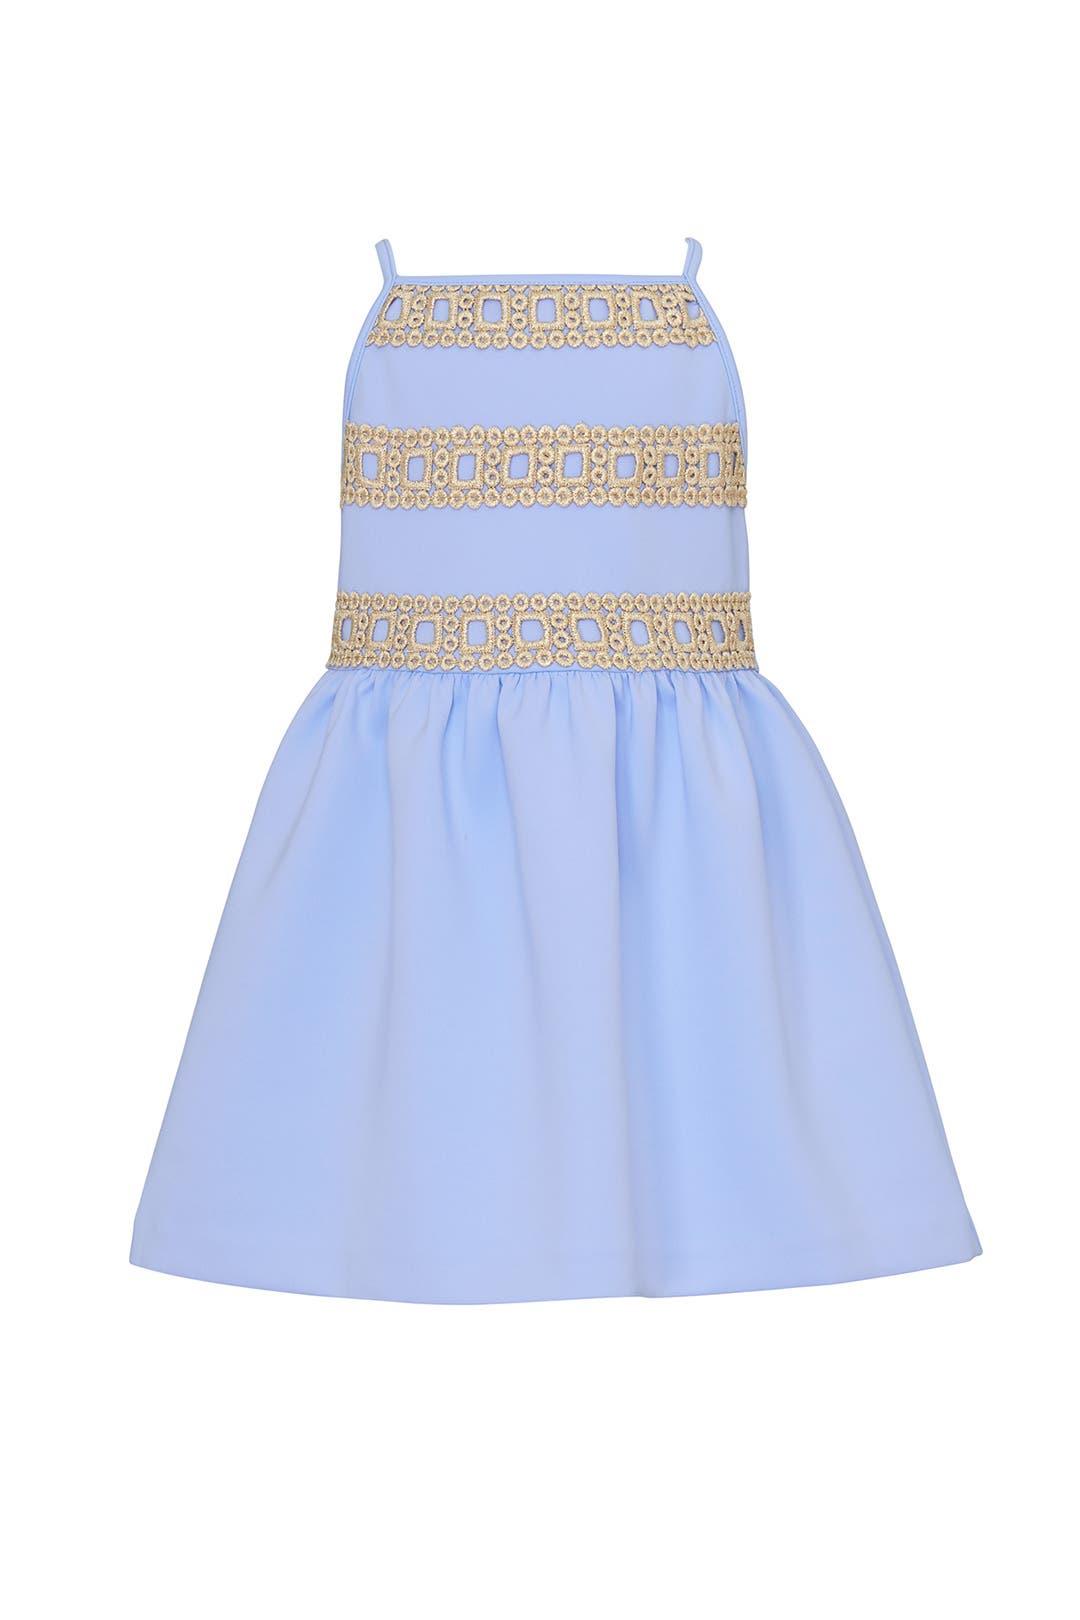 53d95b89d Lilly Pulitzer Kids. Read Reviews. Kids Elize Dress